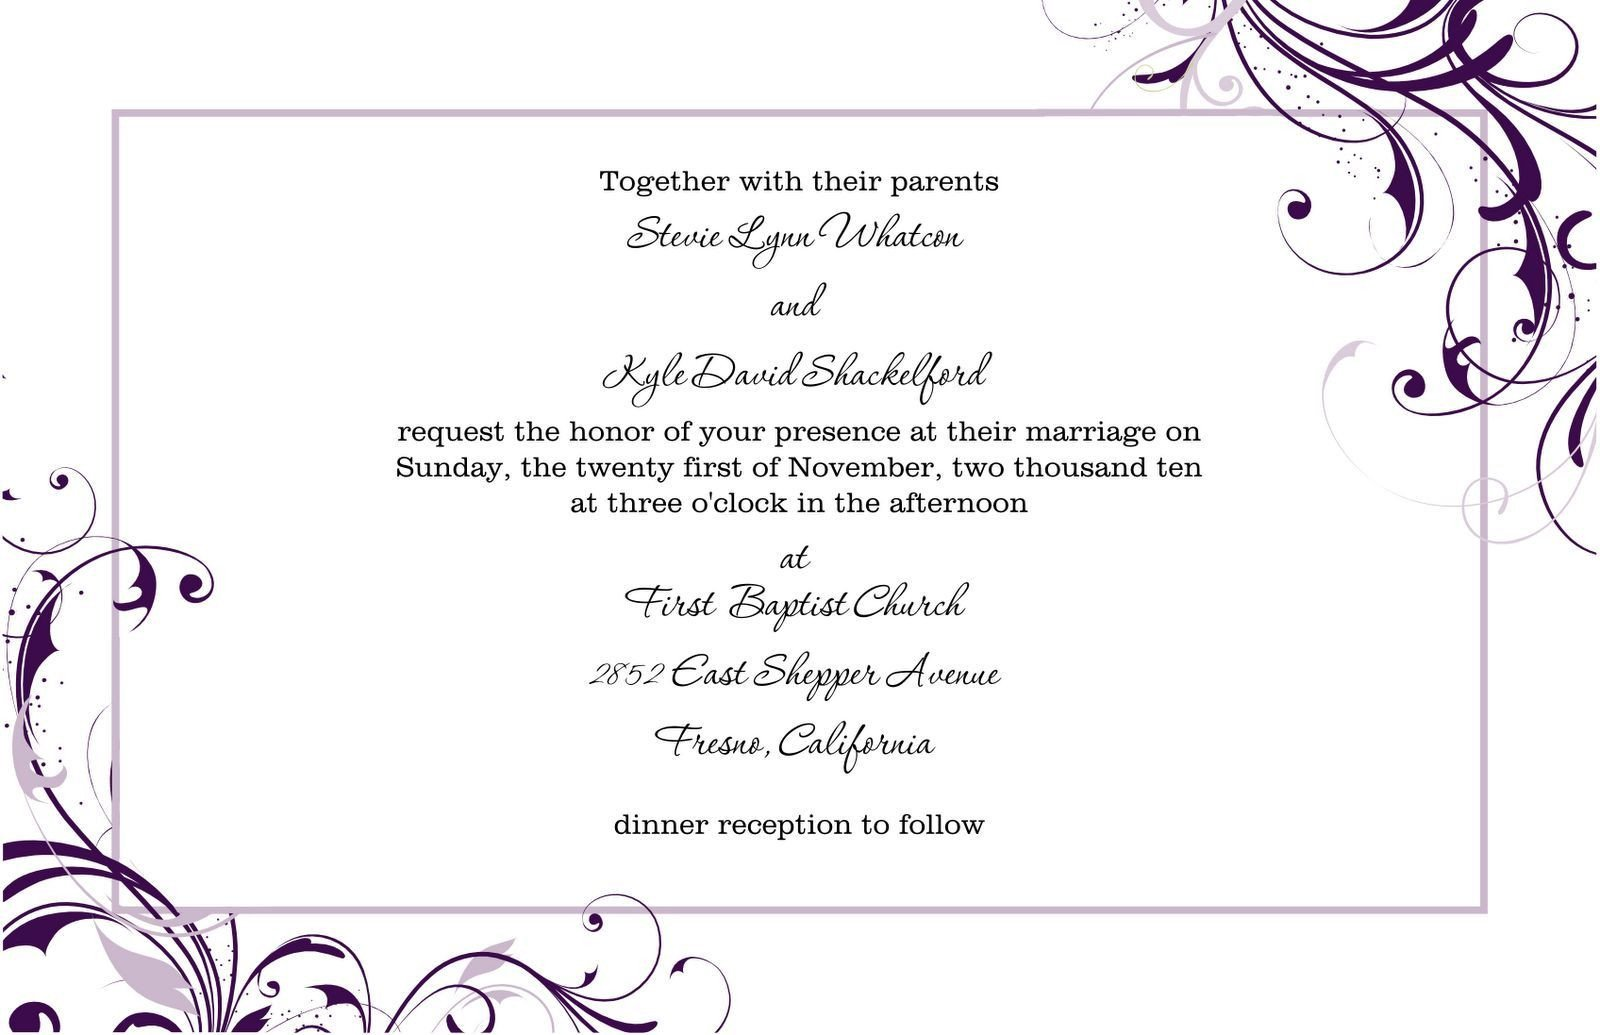 Free Blank Invitation Templates Free Blank Wedding Invitation Templates for Microsoft Word